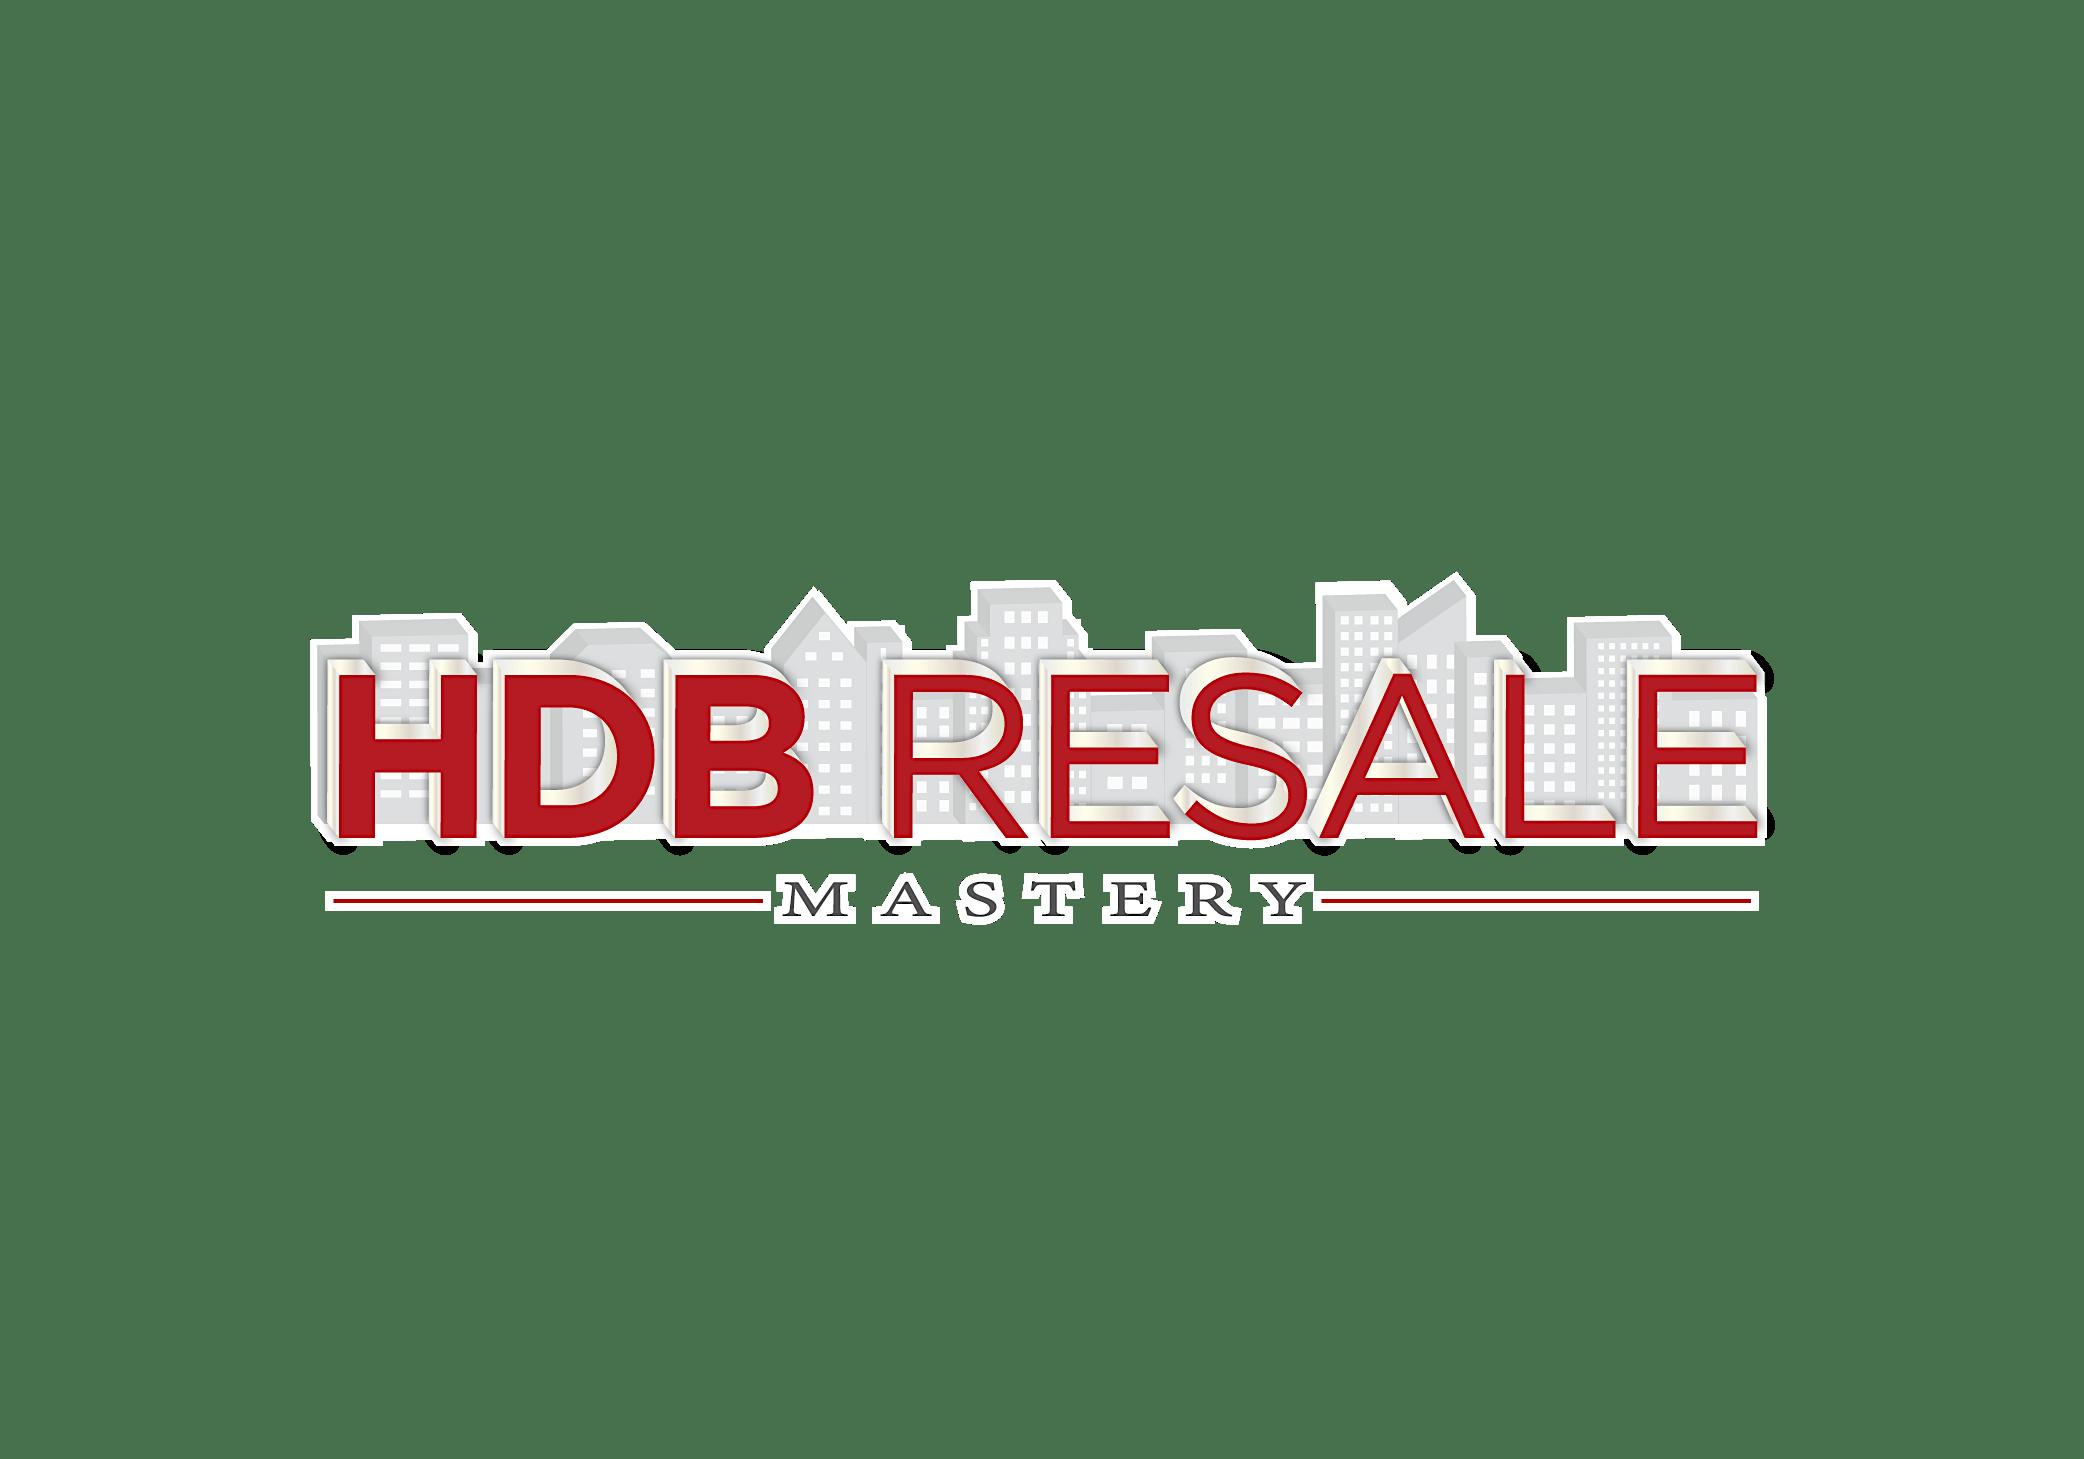 USS 4 : HDB Resale Mastery